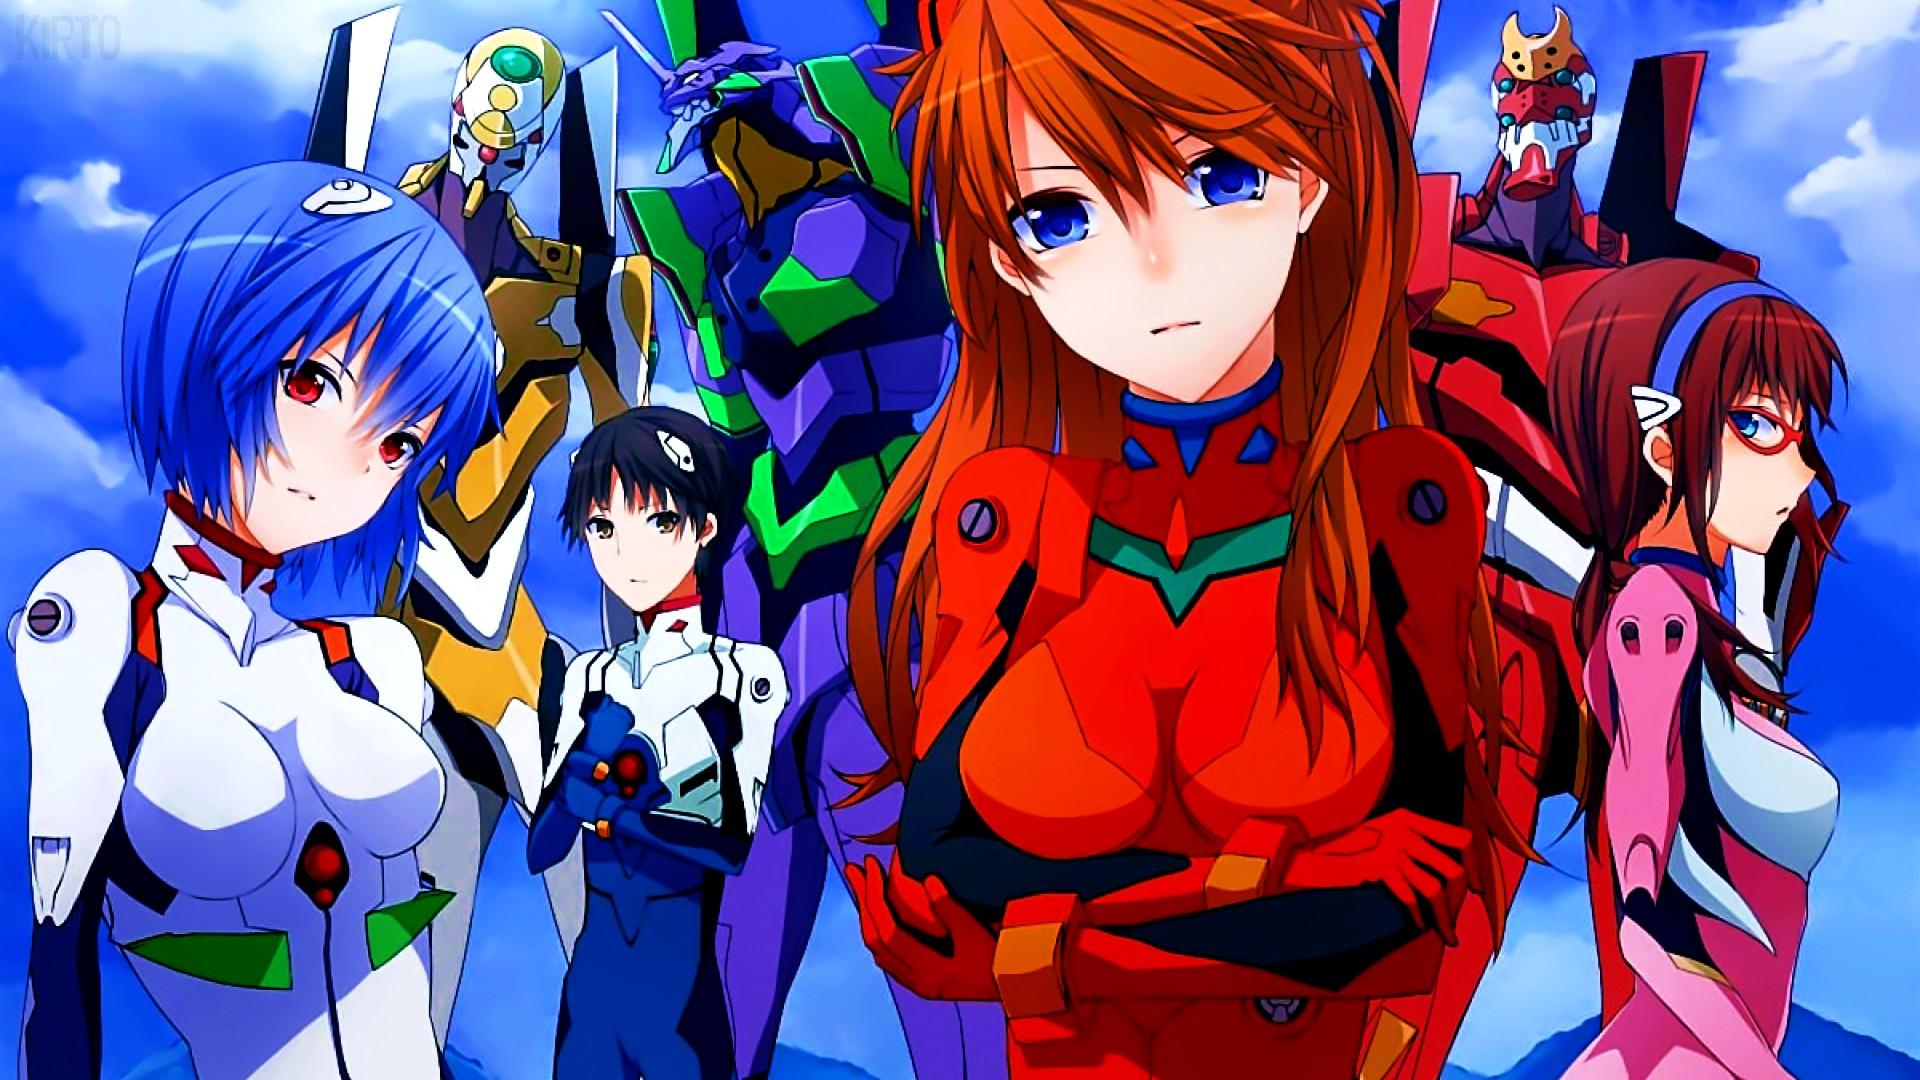 Neon Genesis Evangelion Wallpaper Download Free Full Hd